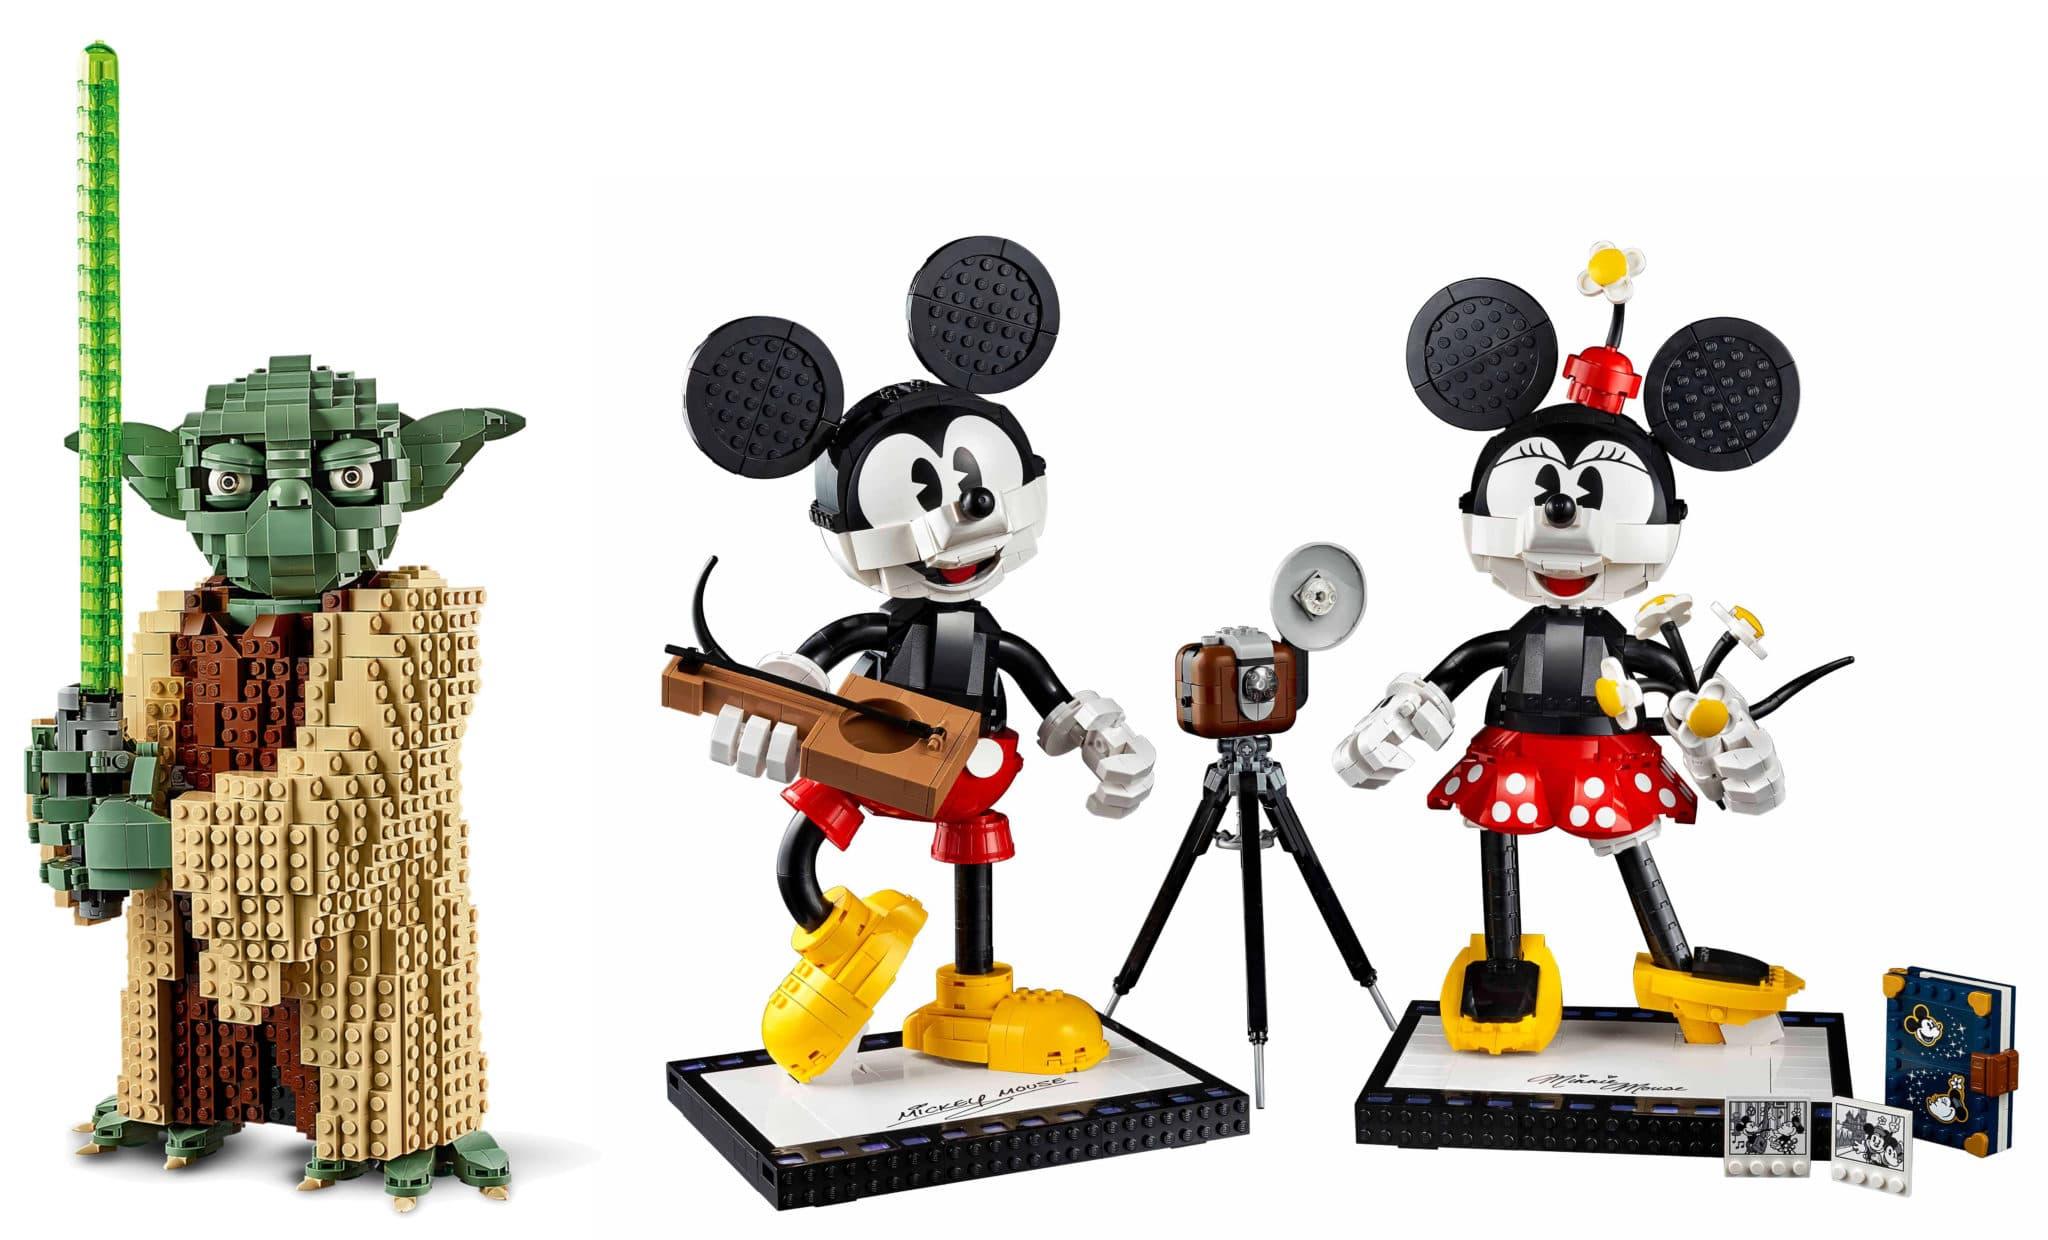 LEGO Disney 43179 Mickey Minnie Größenvergleich